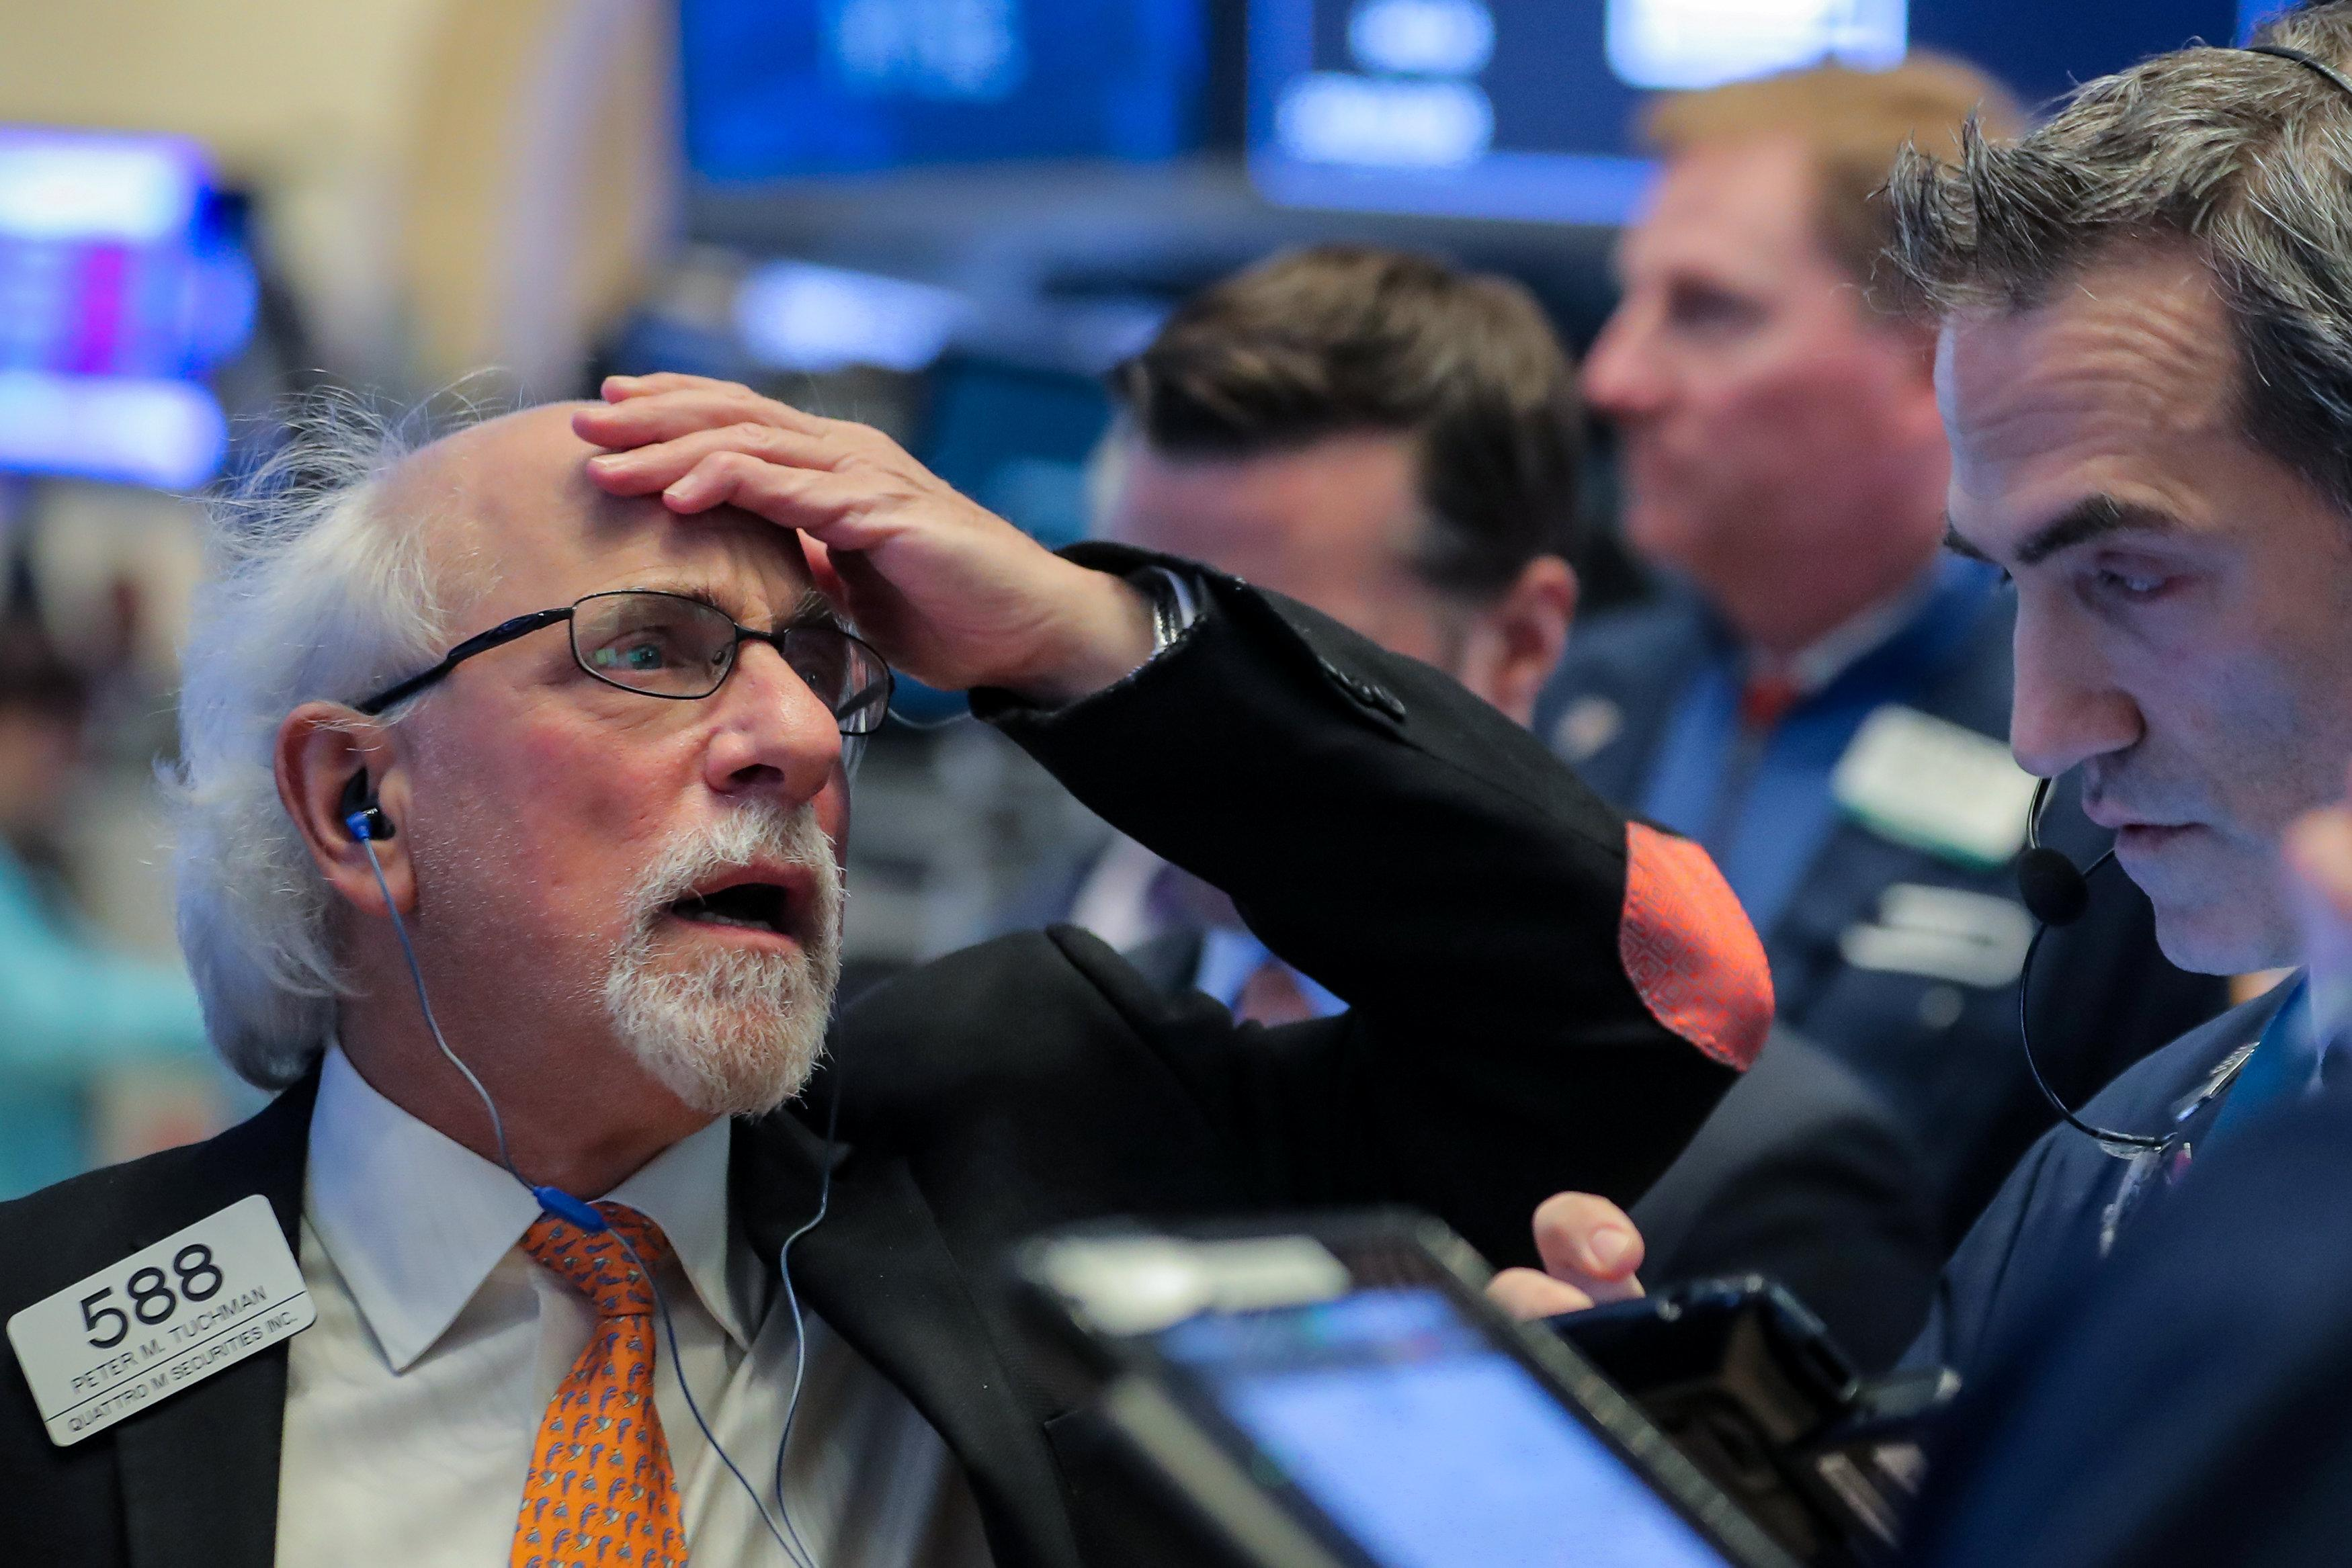 Goldman Sachs's top market themes for 2019